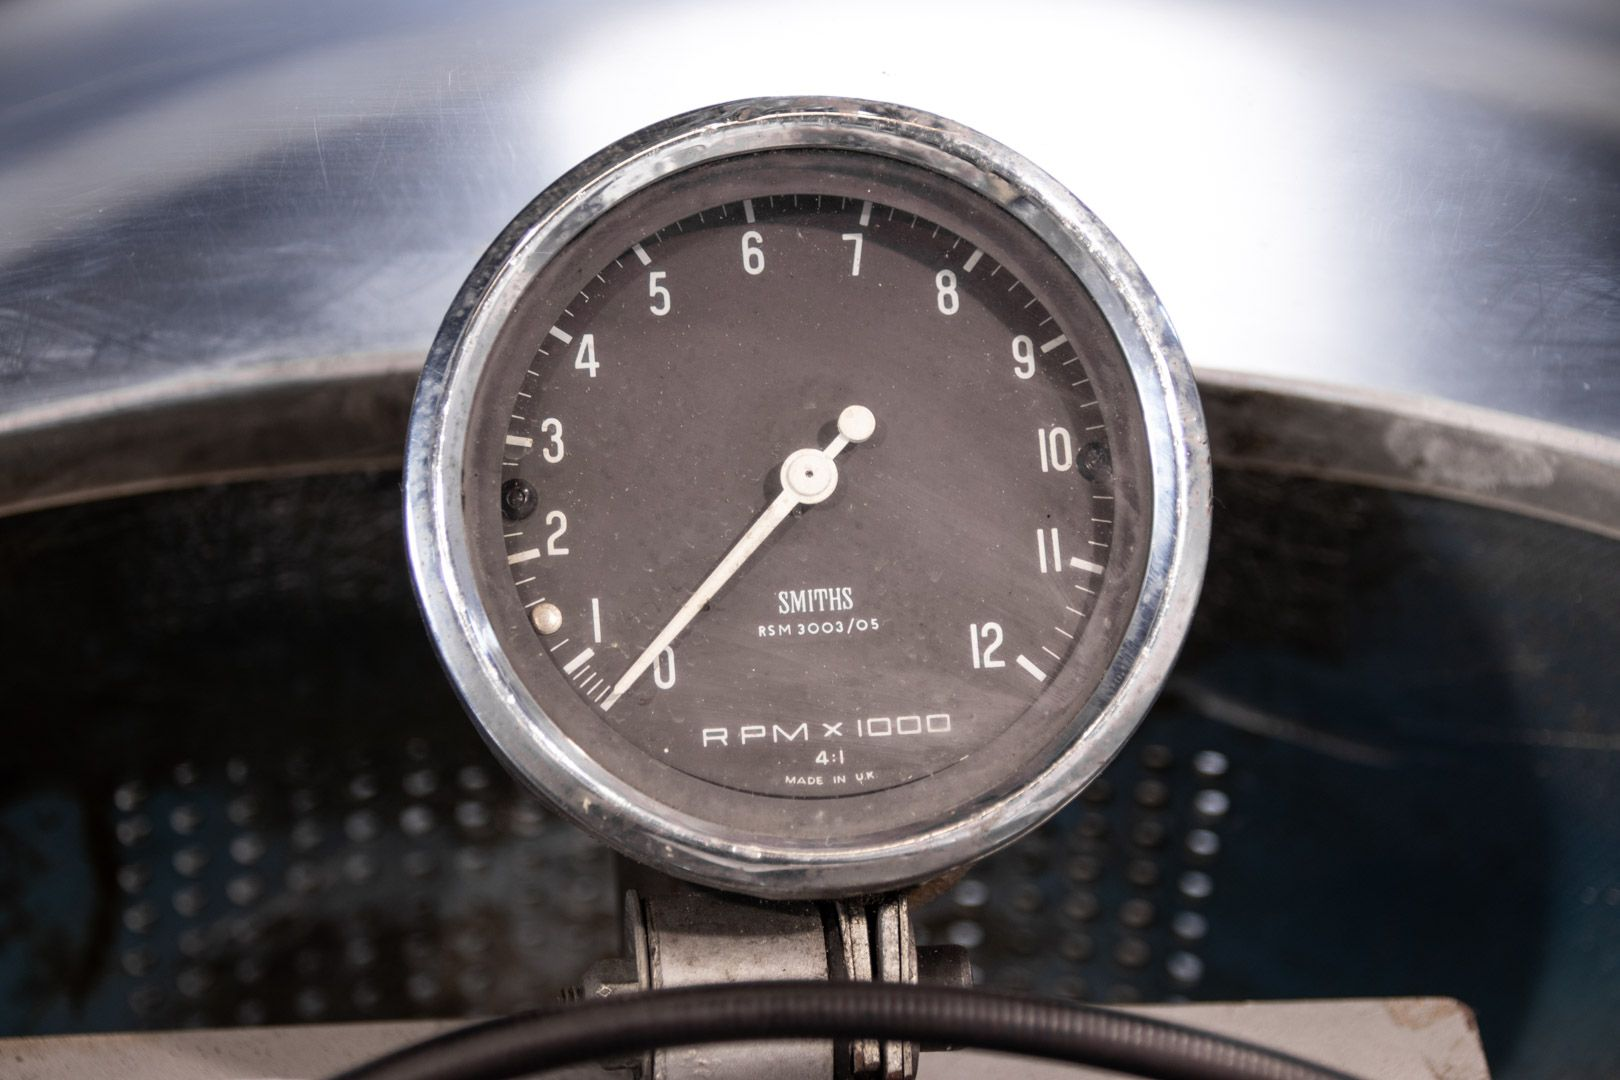 1960 Ducati Mach 1 Corsa NCR 82210